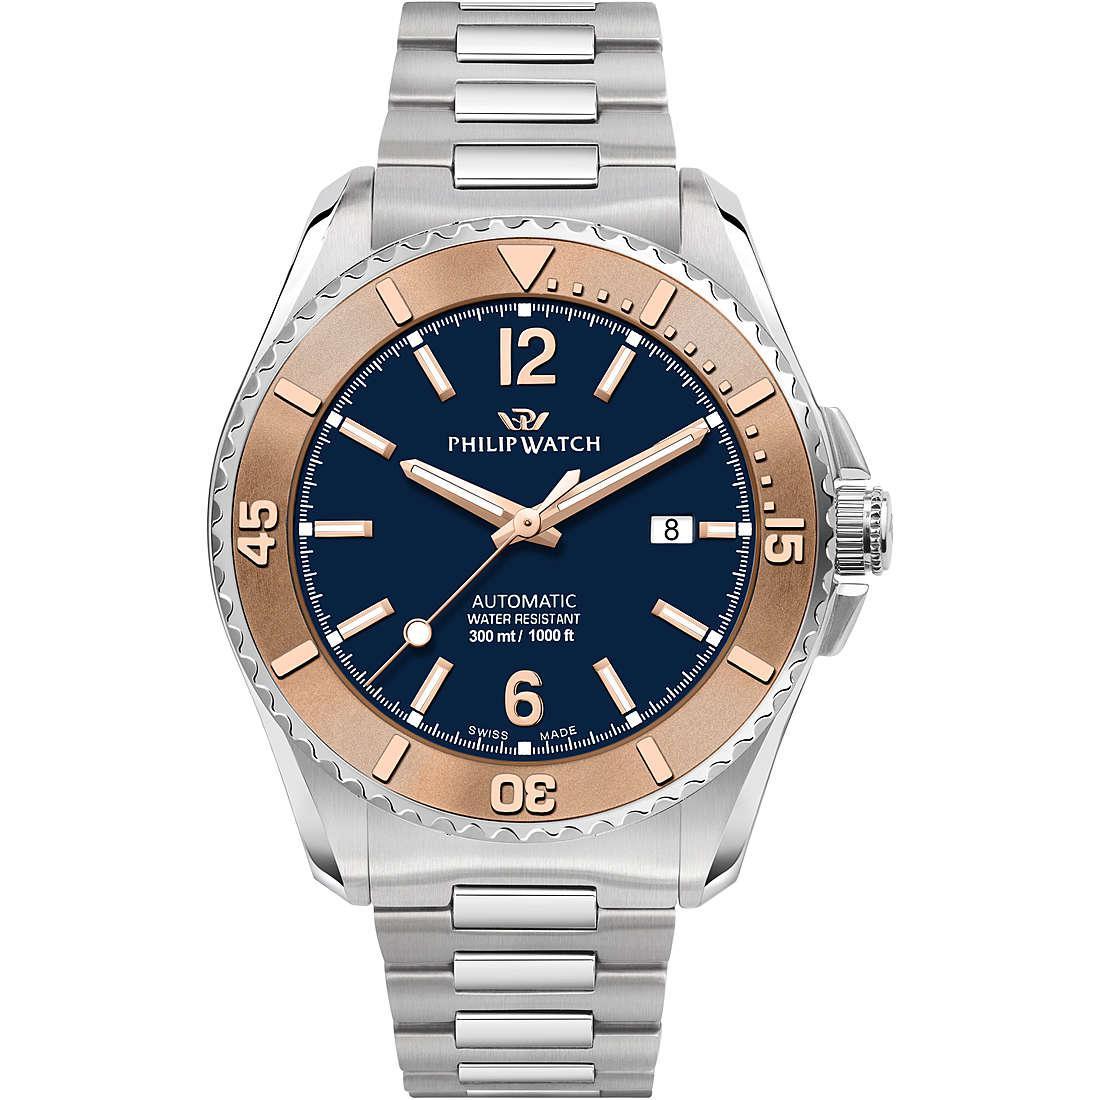 Orologio meccanico uomo philip watch r8223218004